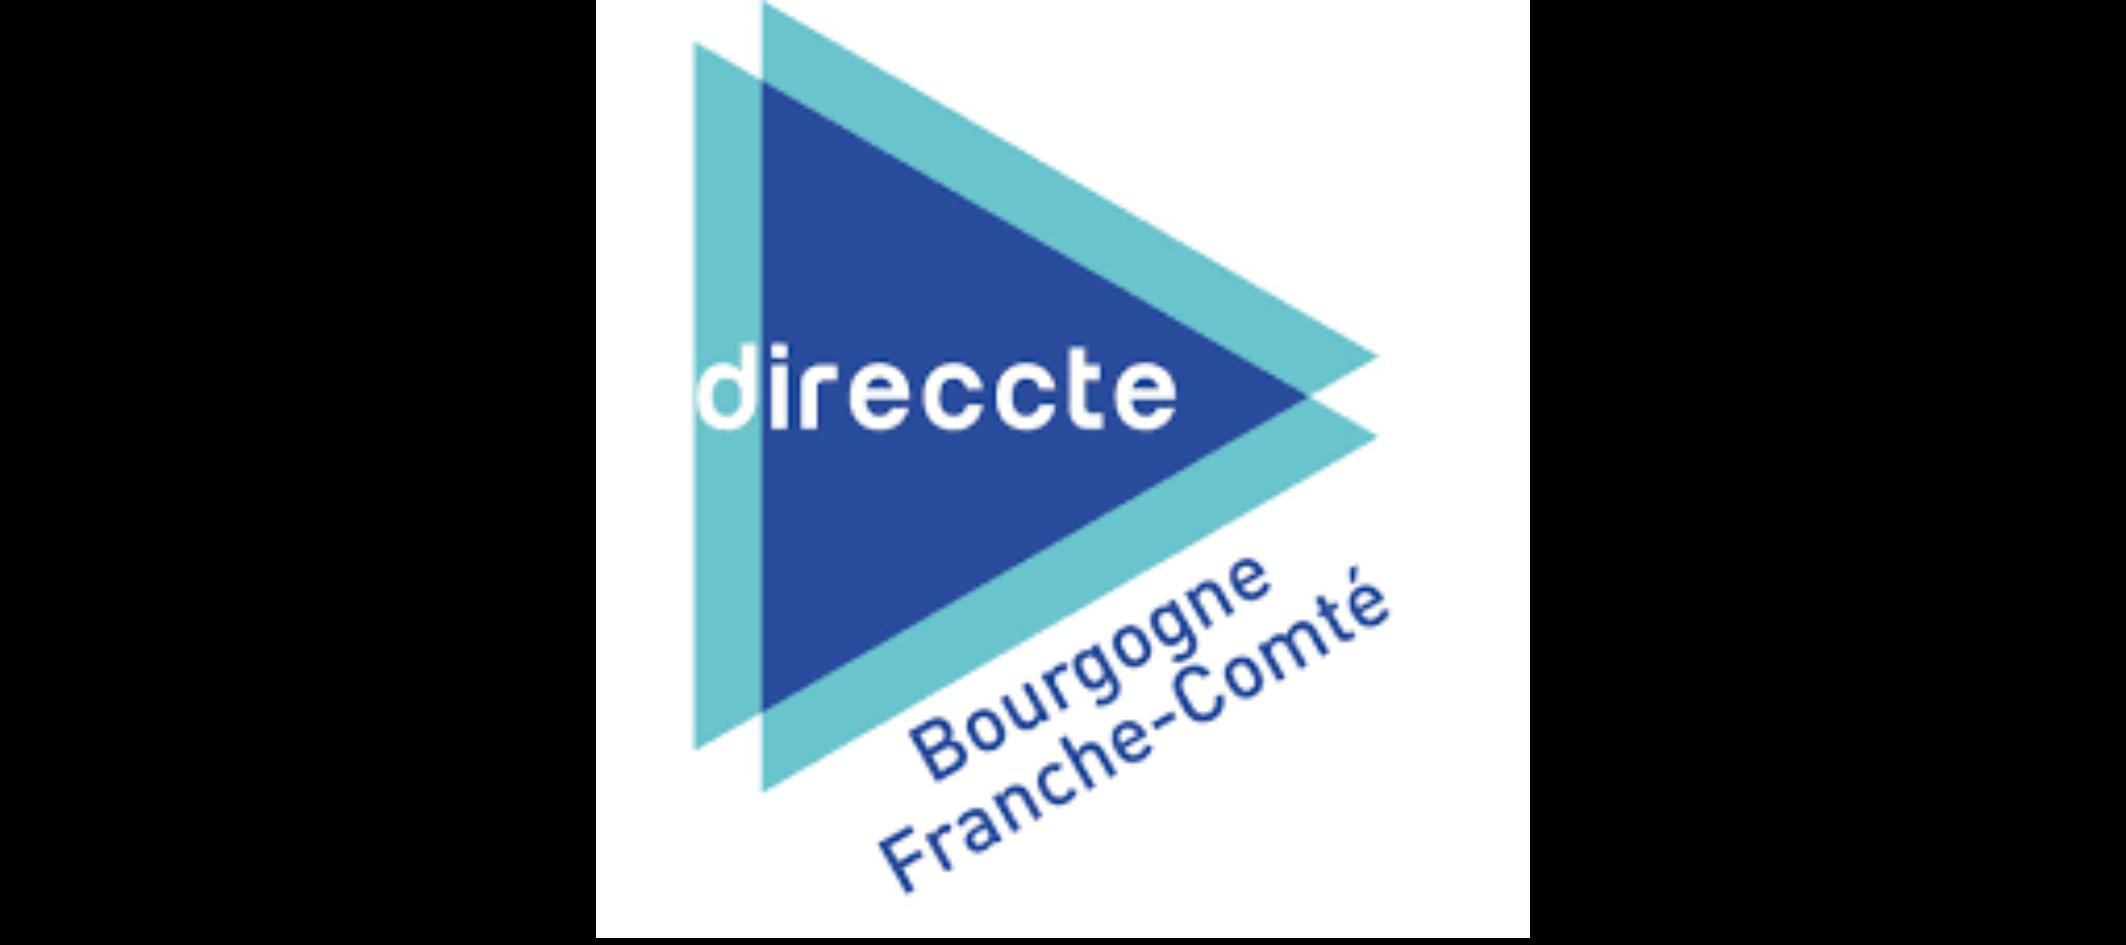 Logo-DIRECCTE-bourgogne-franche-comte